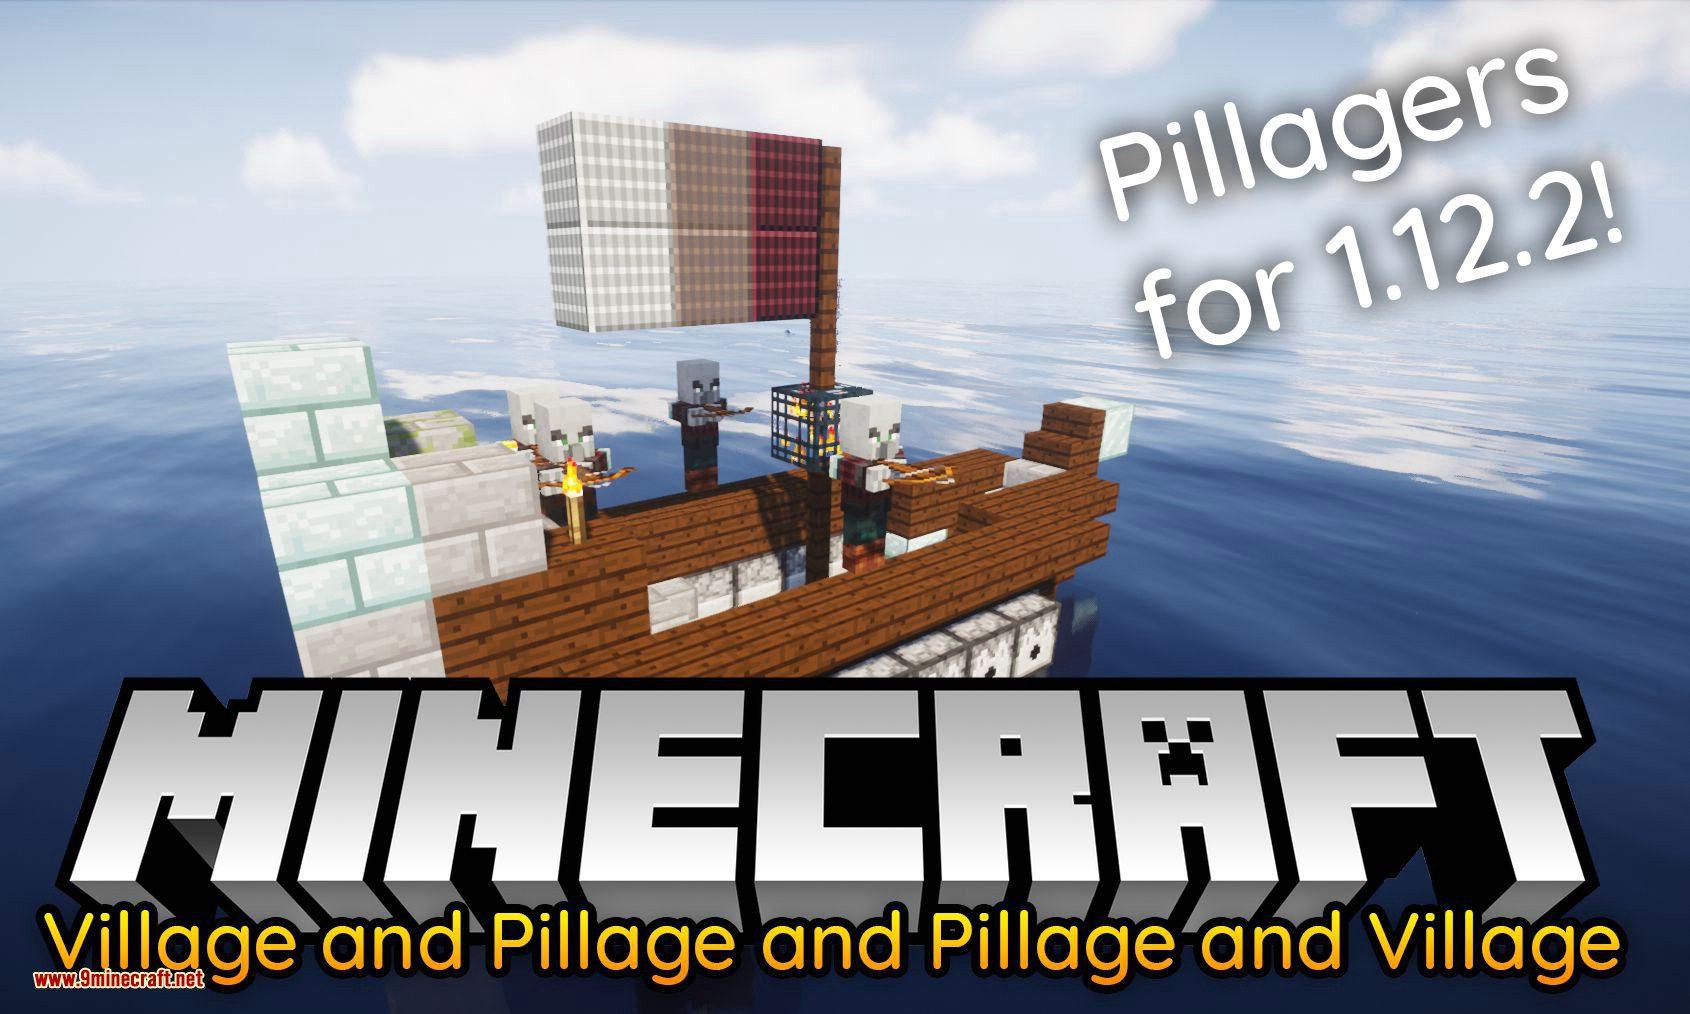 Village and Pillage and Pillage and Village mod for minecraft logo